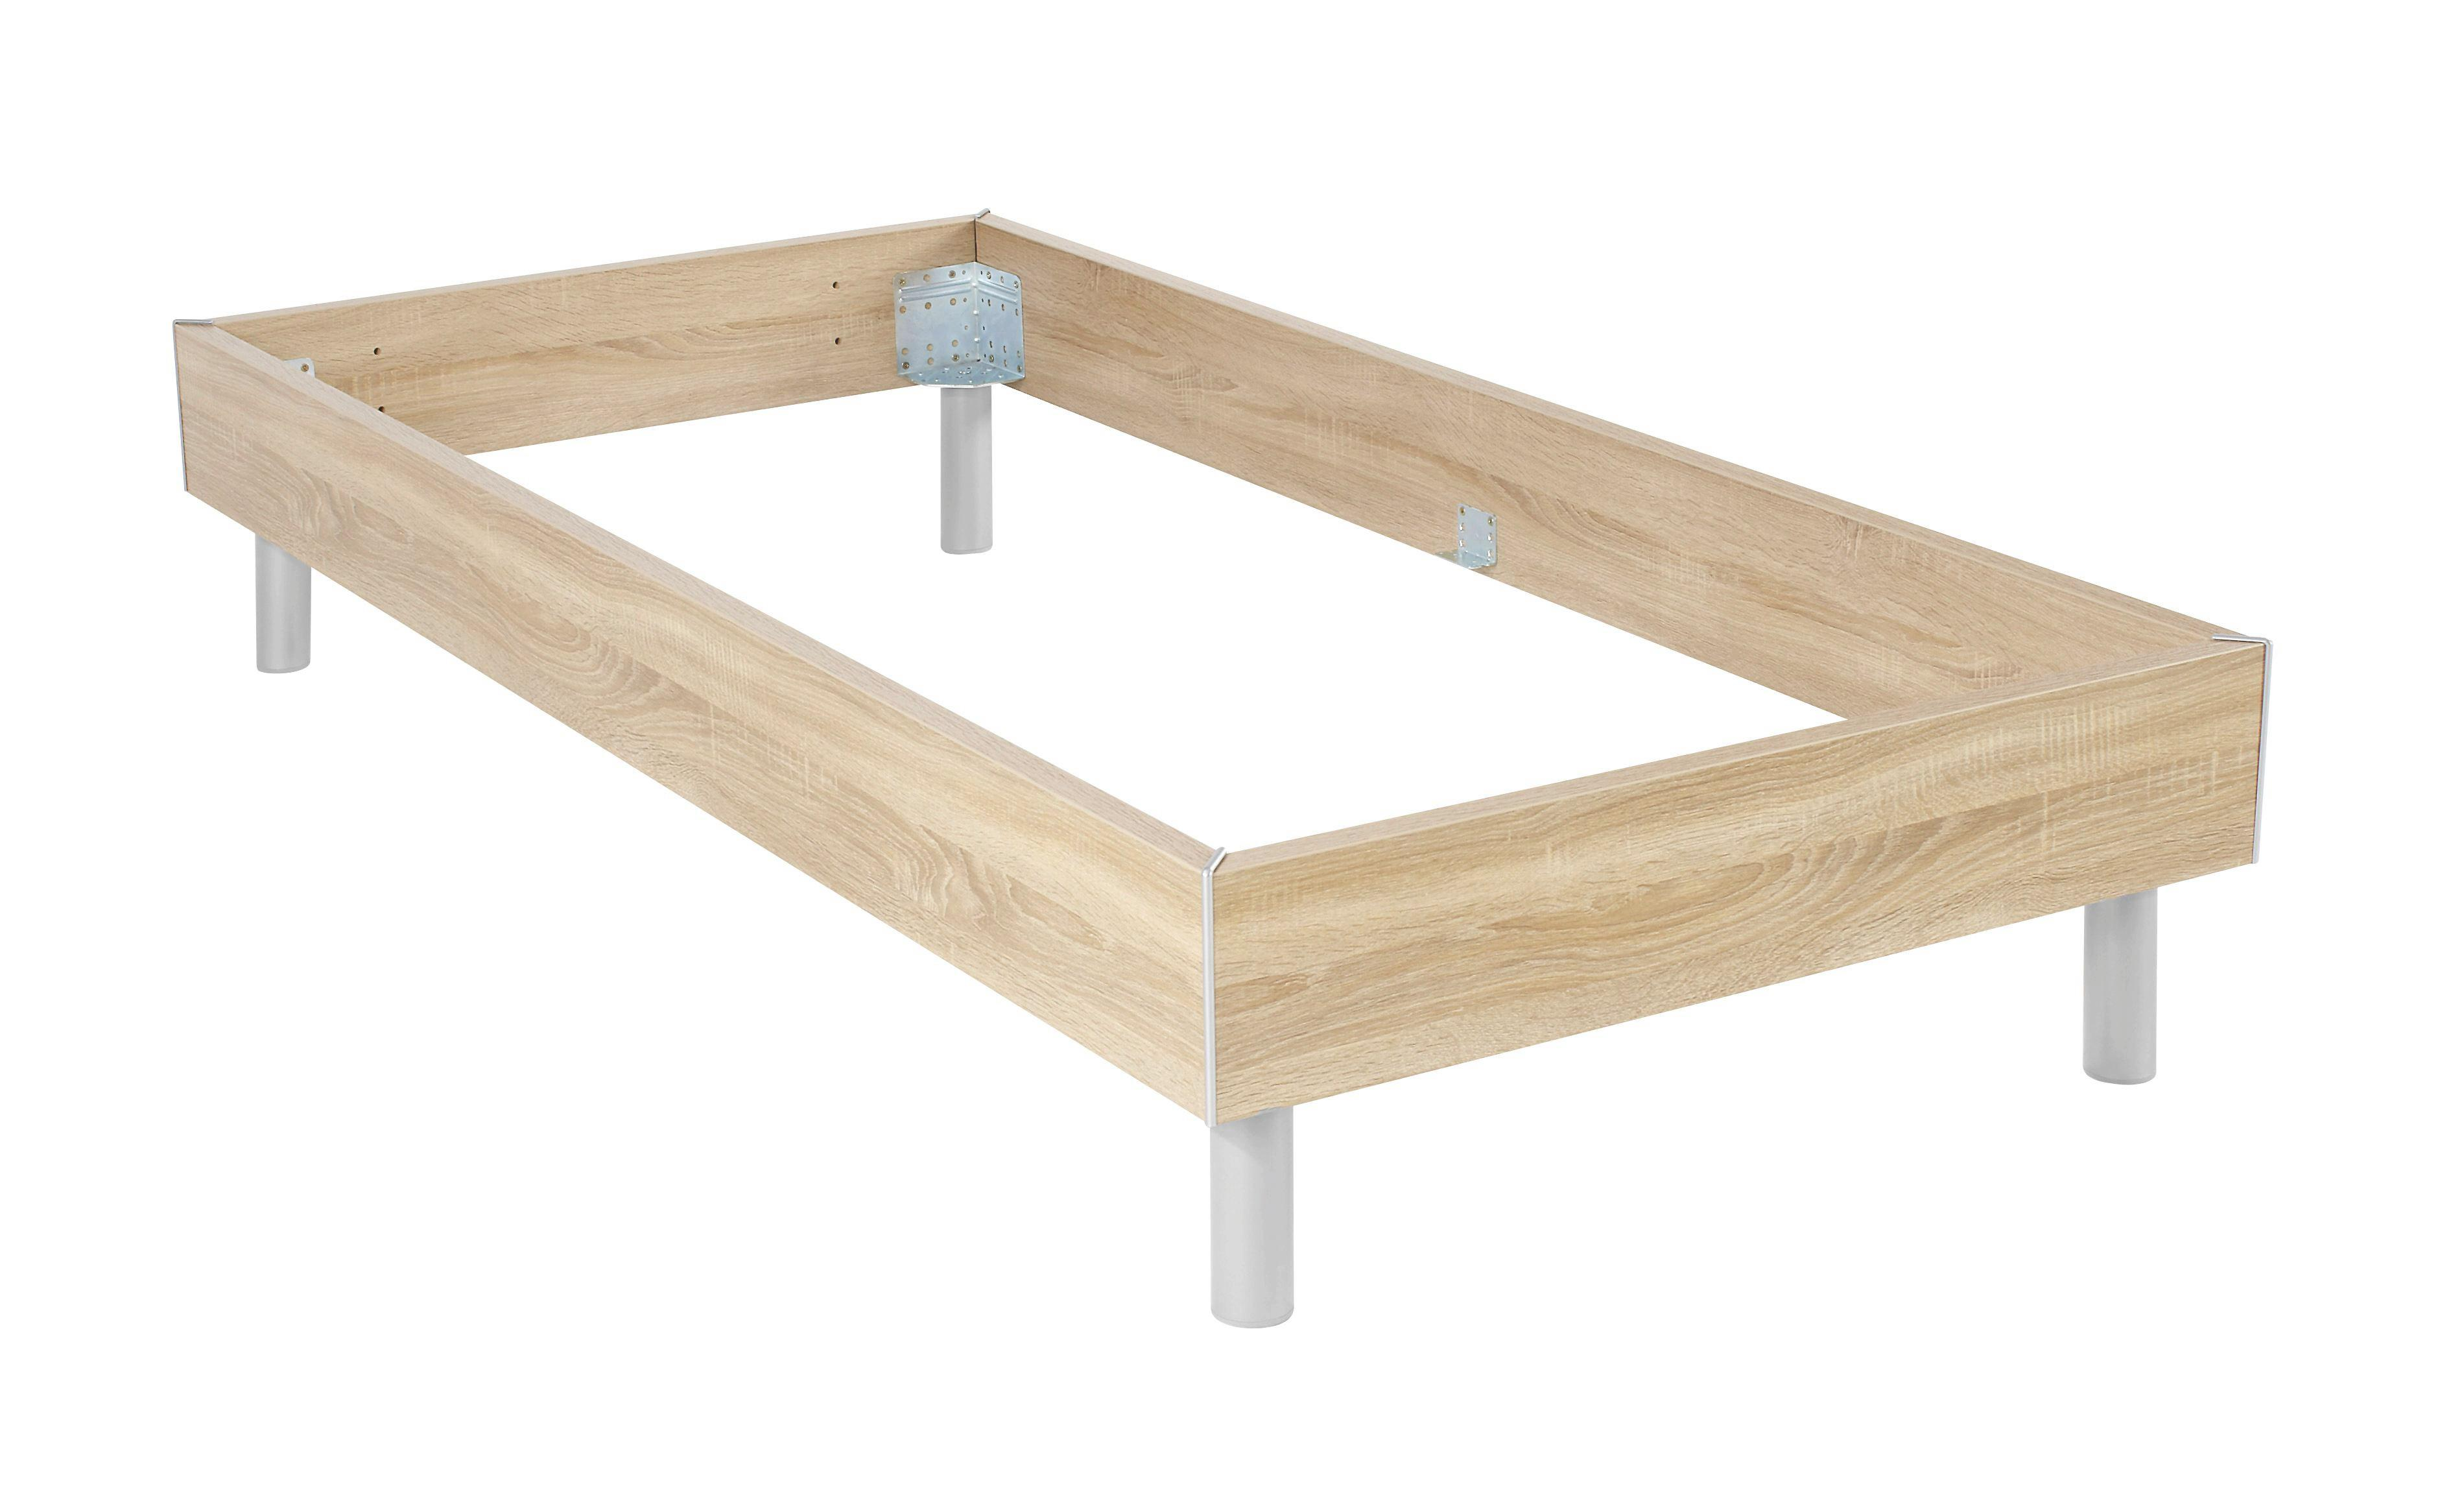 Futonbettrahmen Belia, 120x200 cm - Alufarben, KONVENTIONELL, Holz (120/200cm)